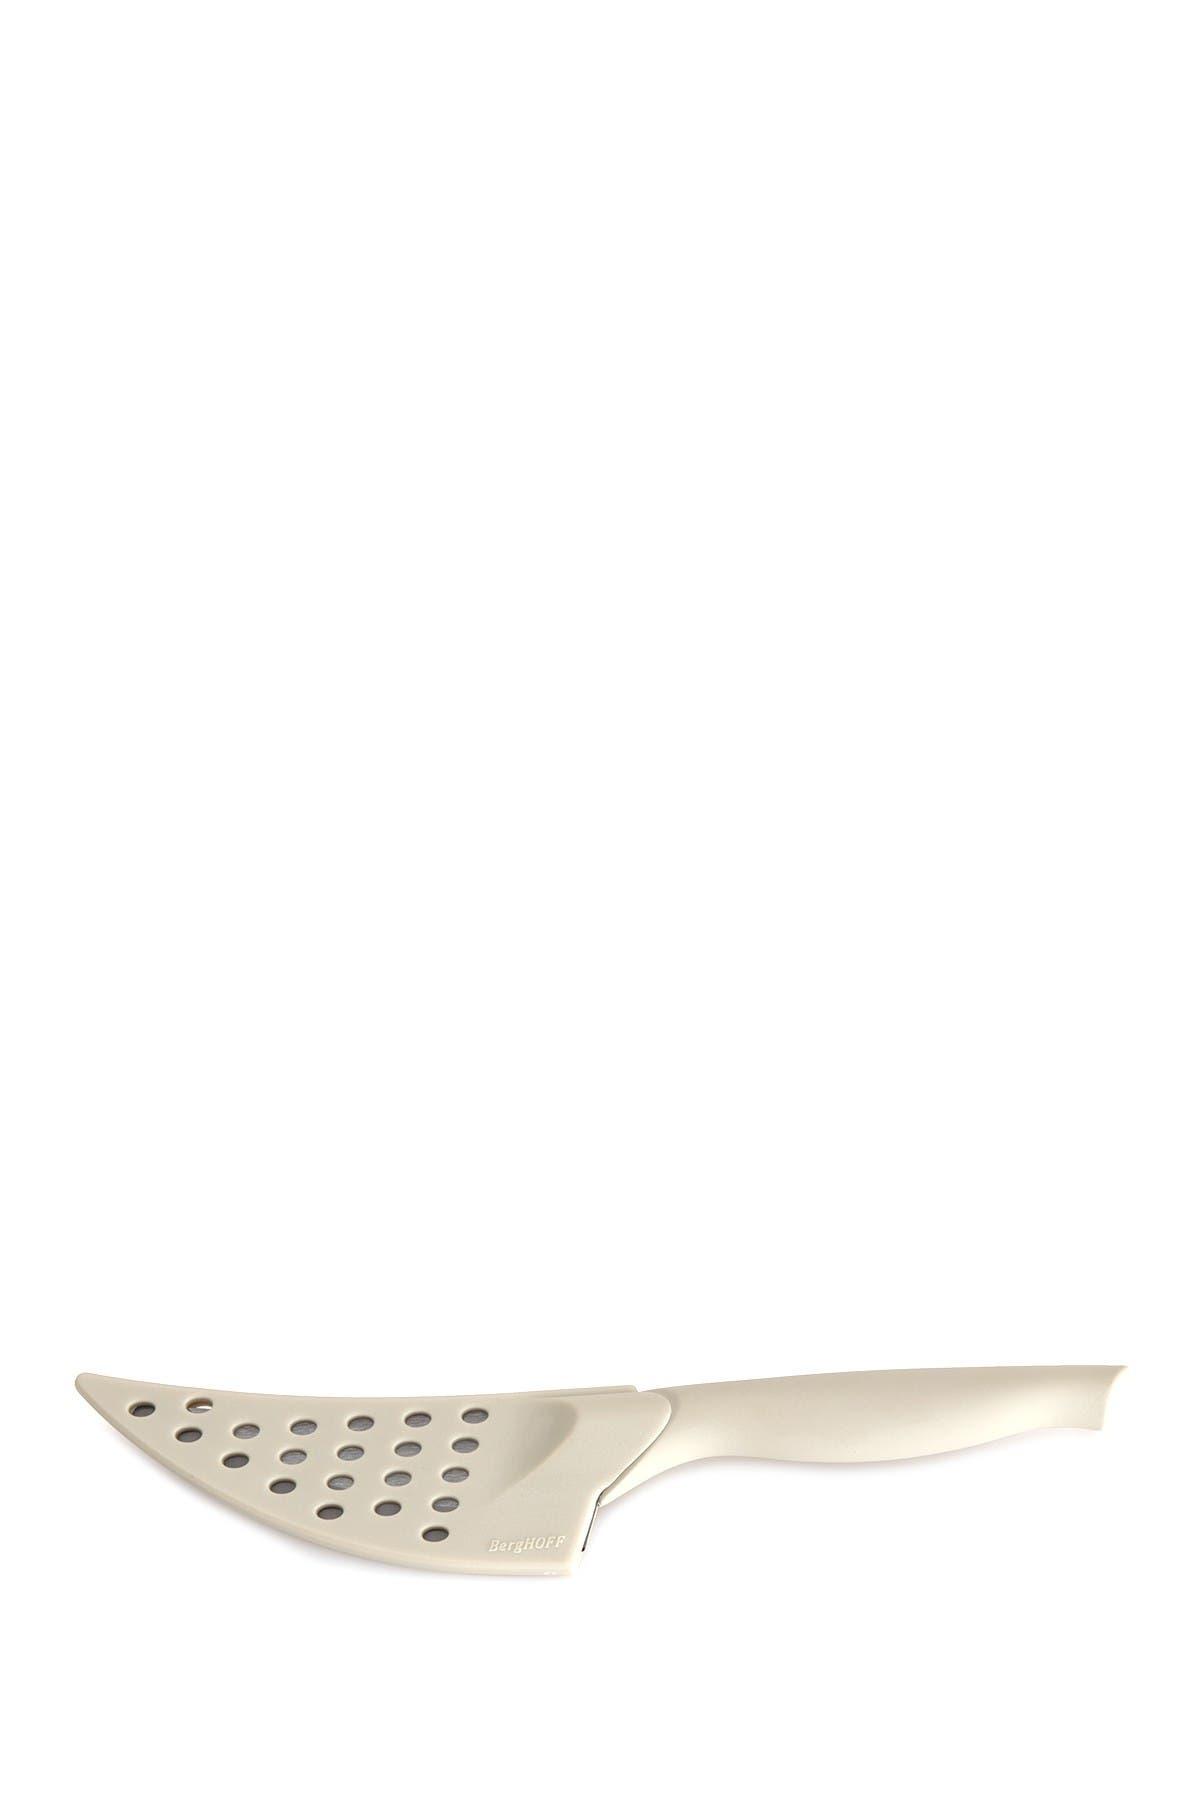 "Image of BergHOFF 4"" Tan Ceramic Cheese Knife"